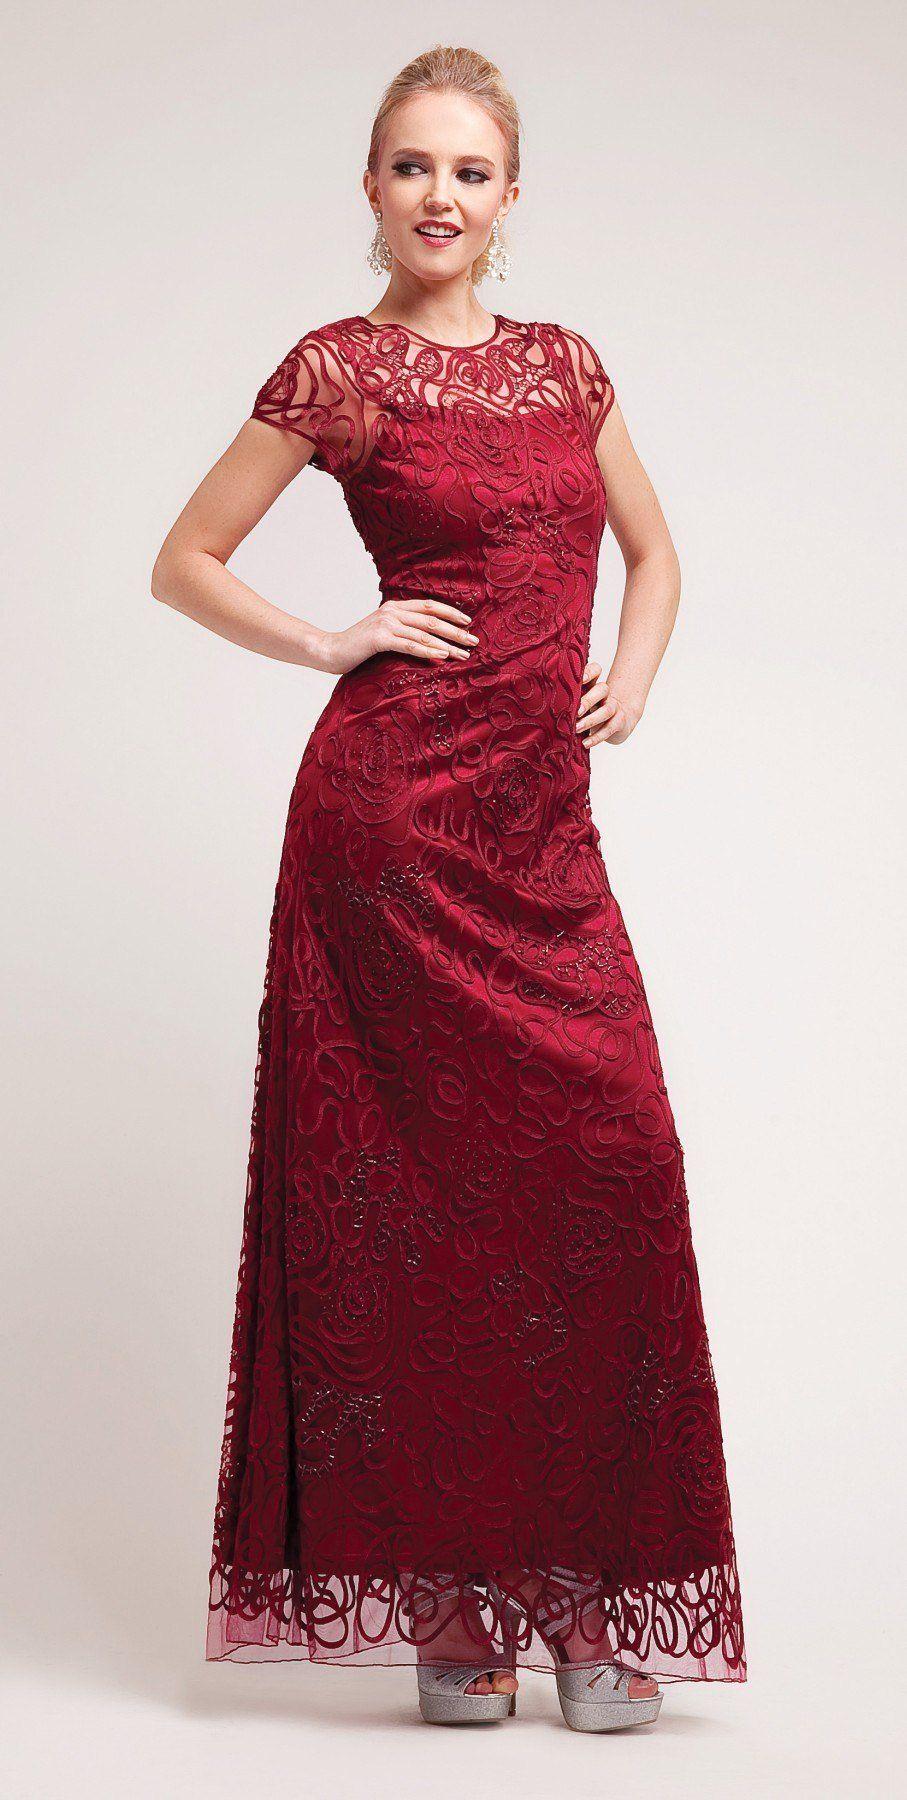 Semi Formal Long Lace Burgundy Dress Tea Length Short Sleeve | Tea ...